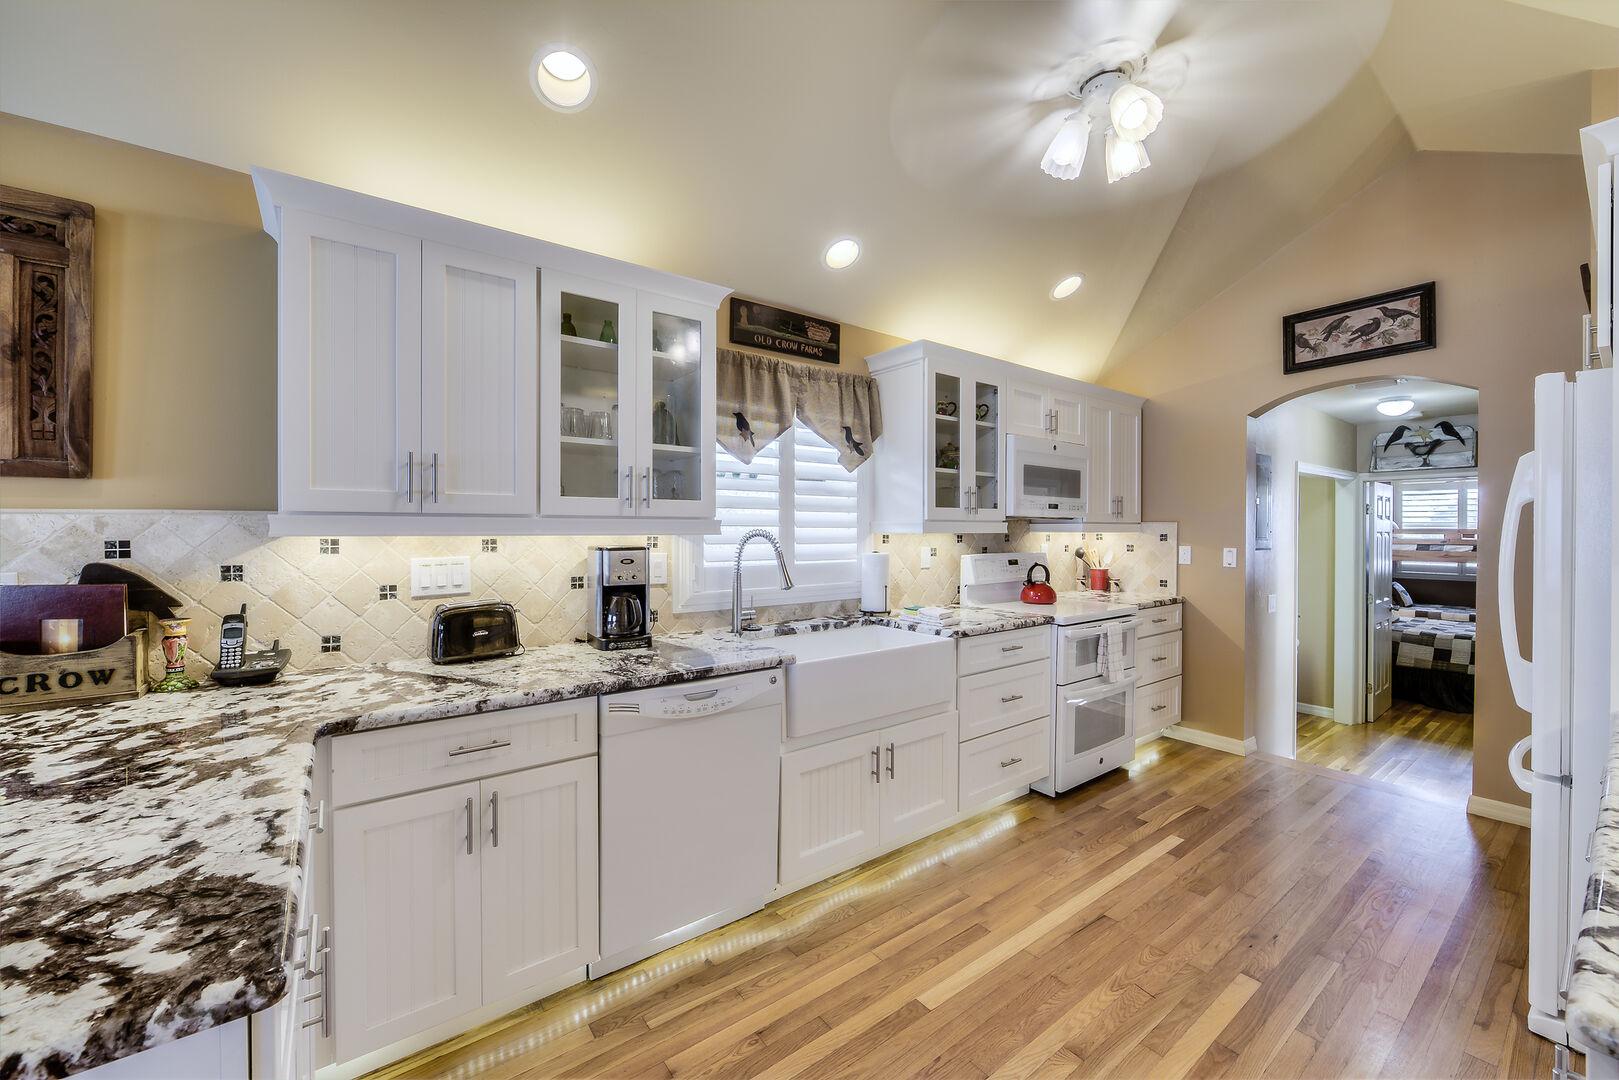 Crow's Nest Kitchen Fort Myers Beach Rental